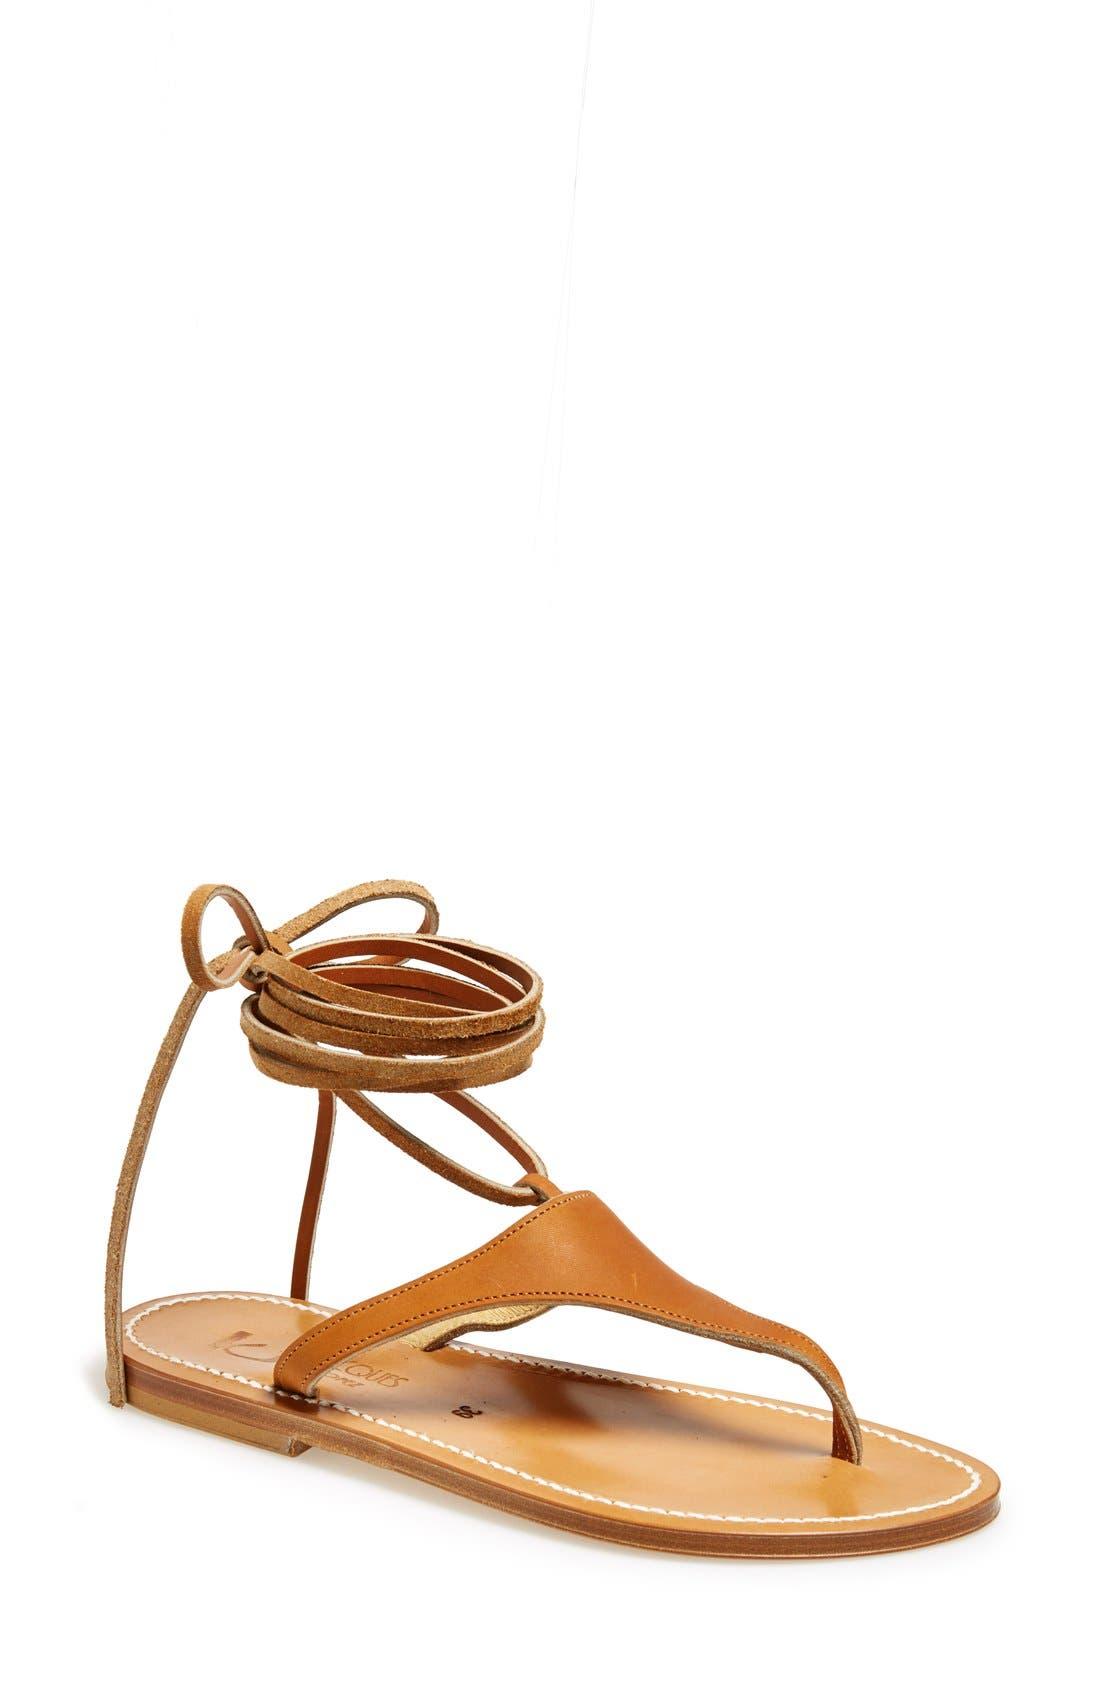 Alternate Image 1 Selected - K.Jacques St. Tropez Ankle Wrap Thong Sandal (Women)